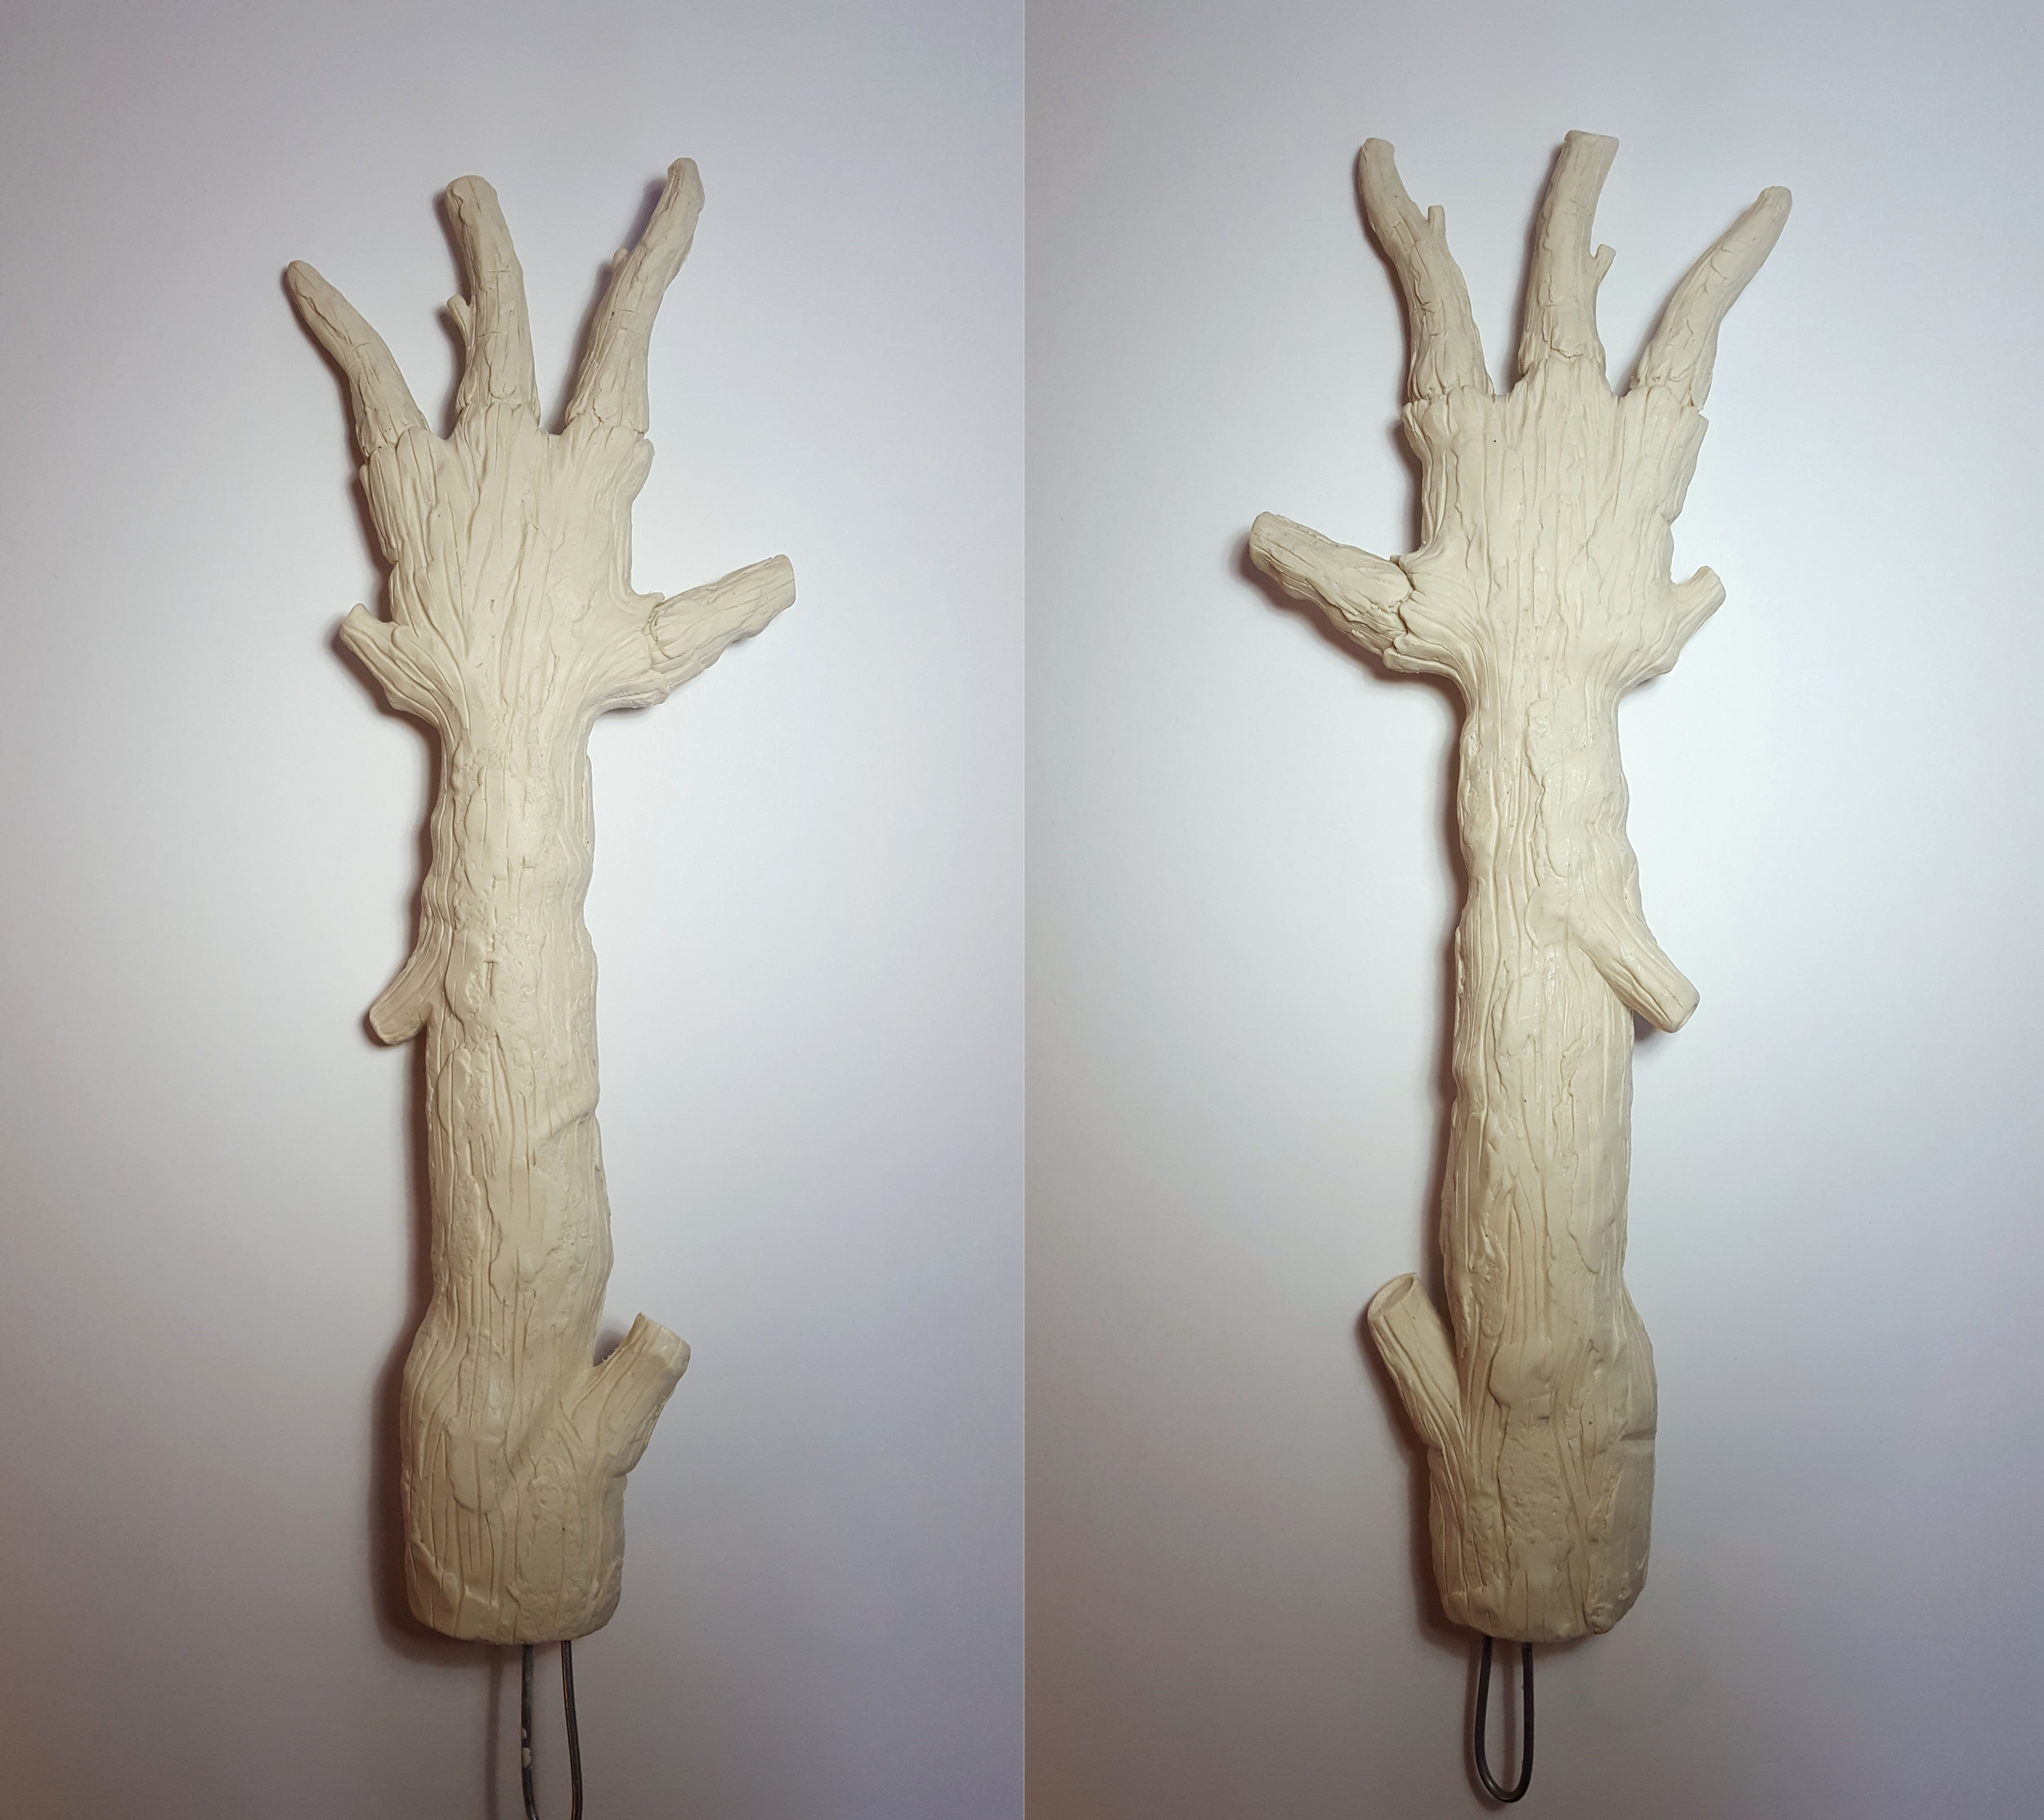 Stick Person Hands